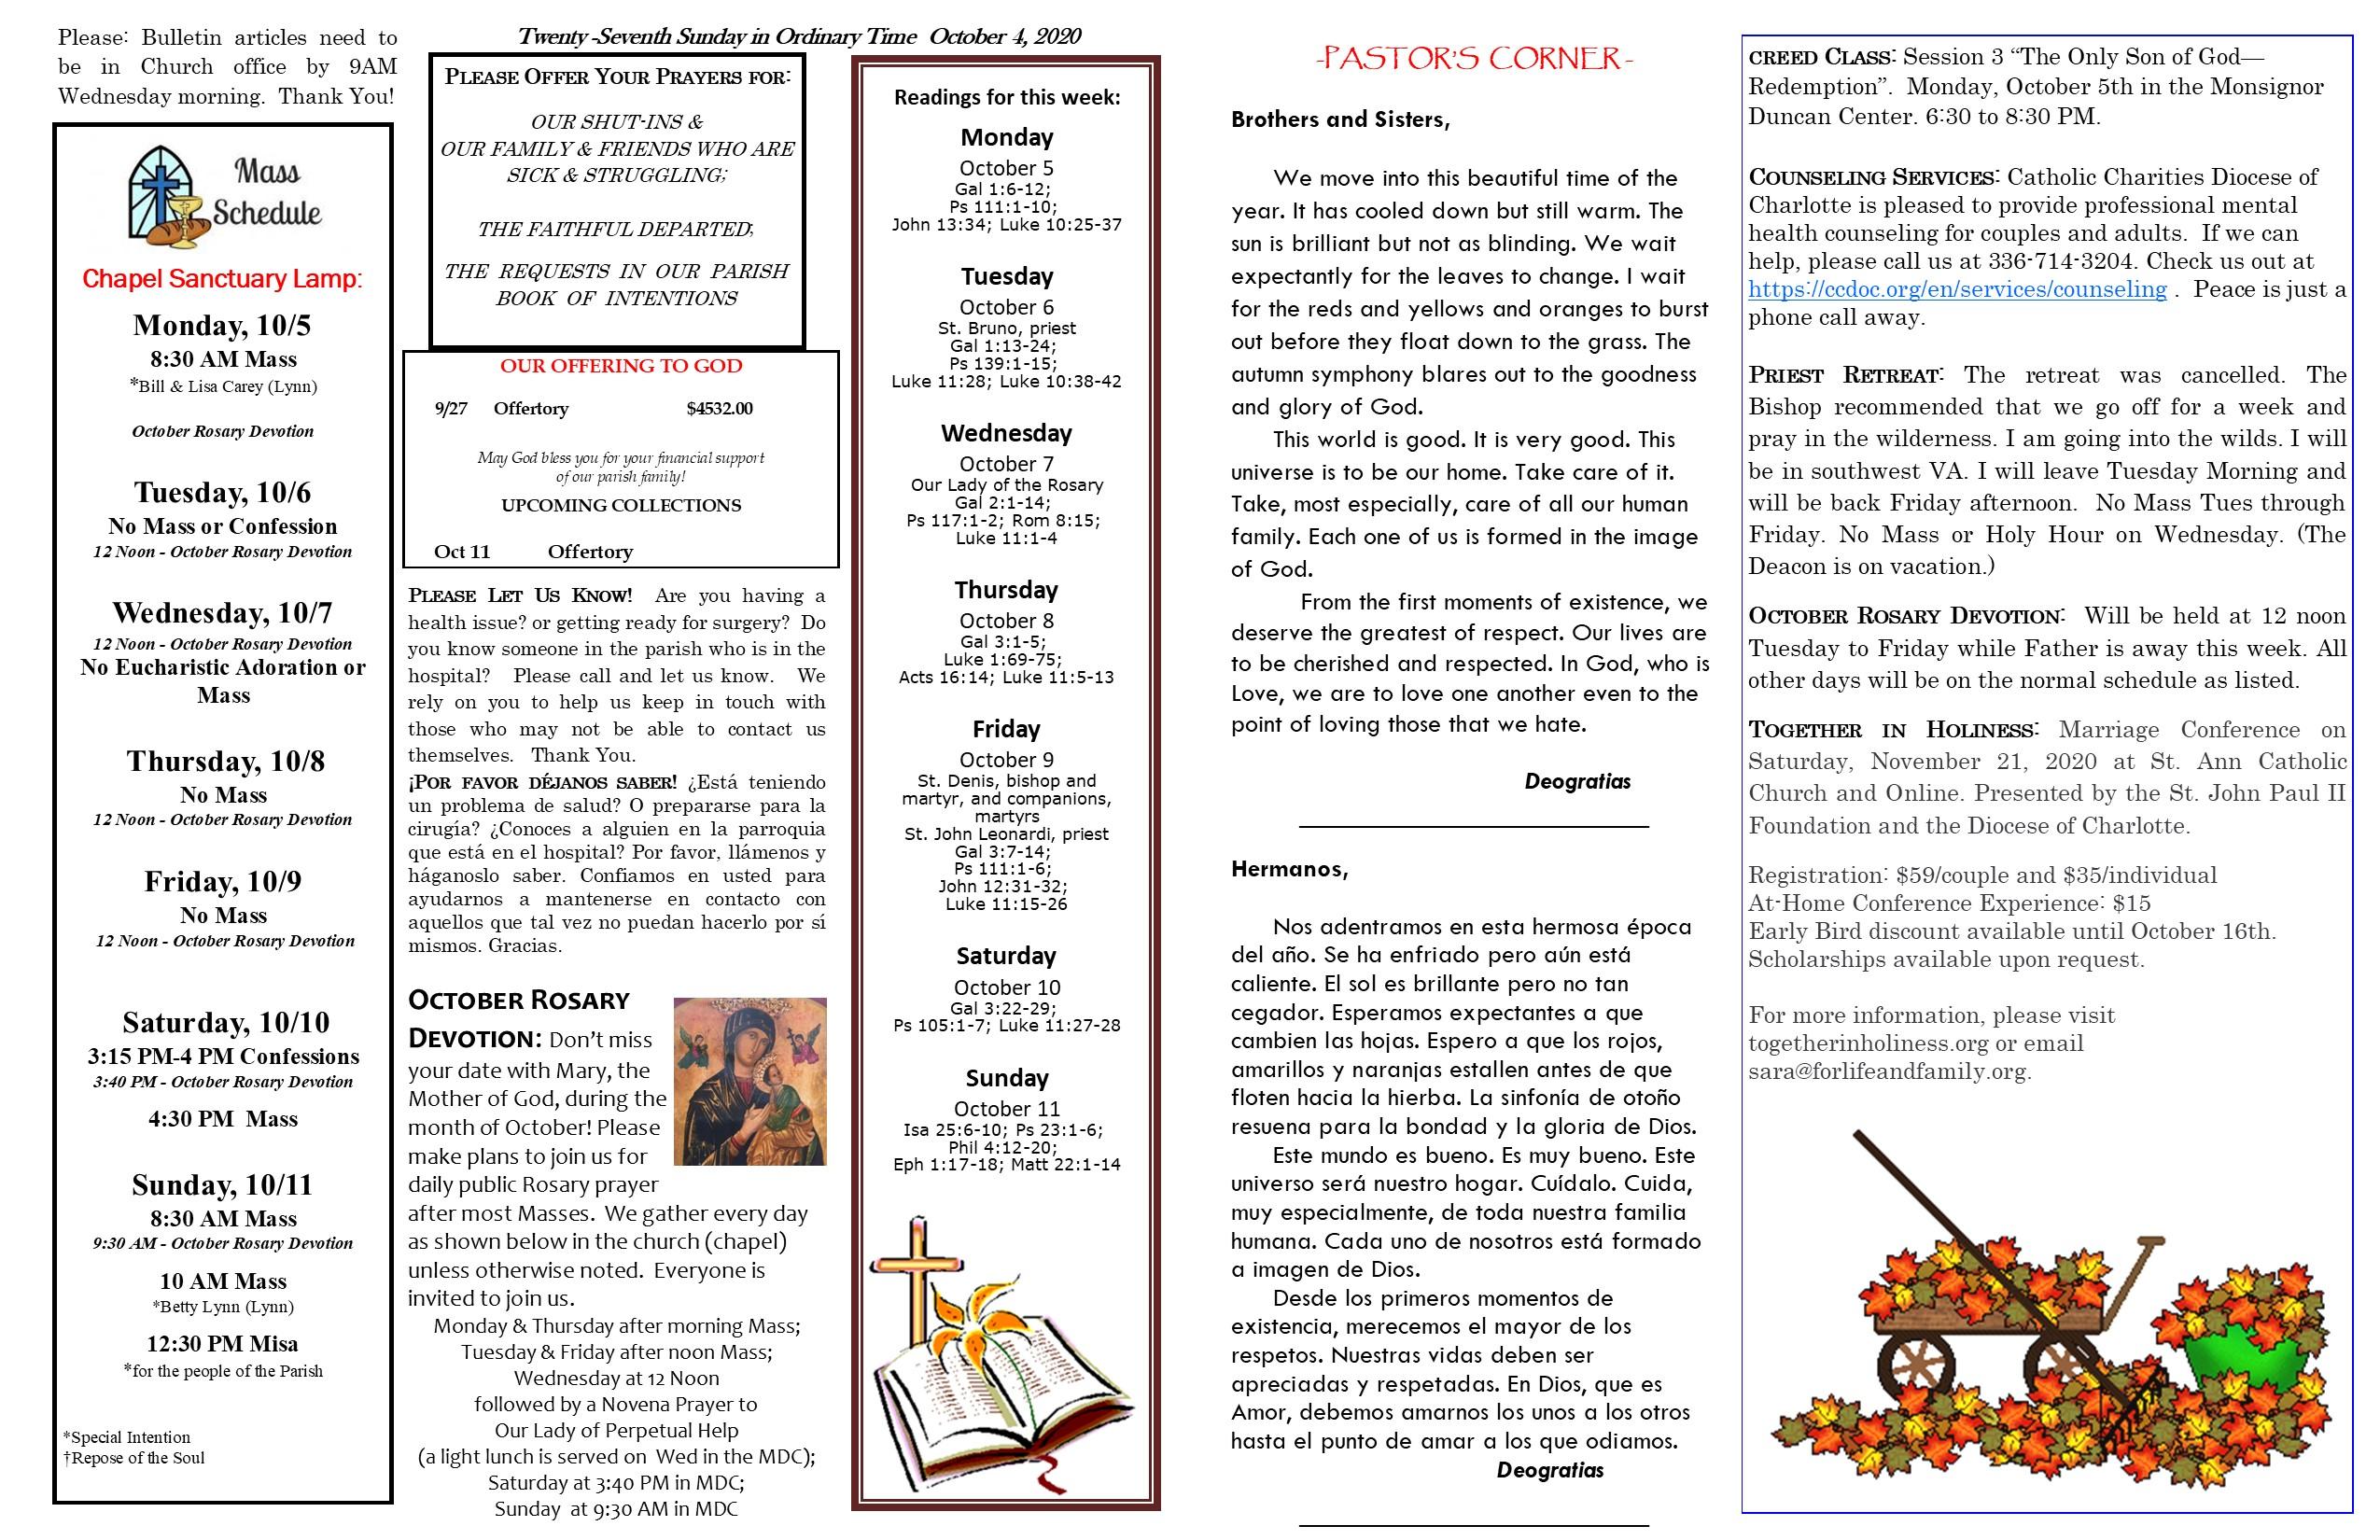 October 4 2020 page 2.jpg